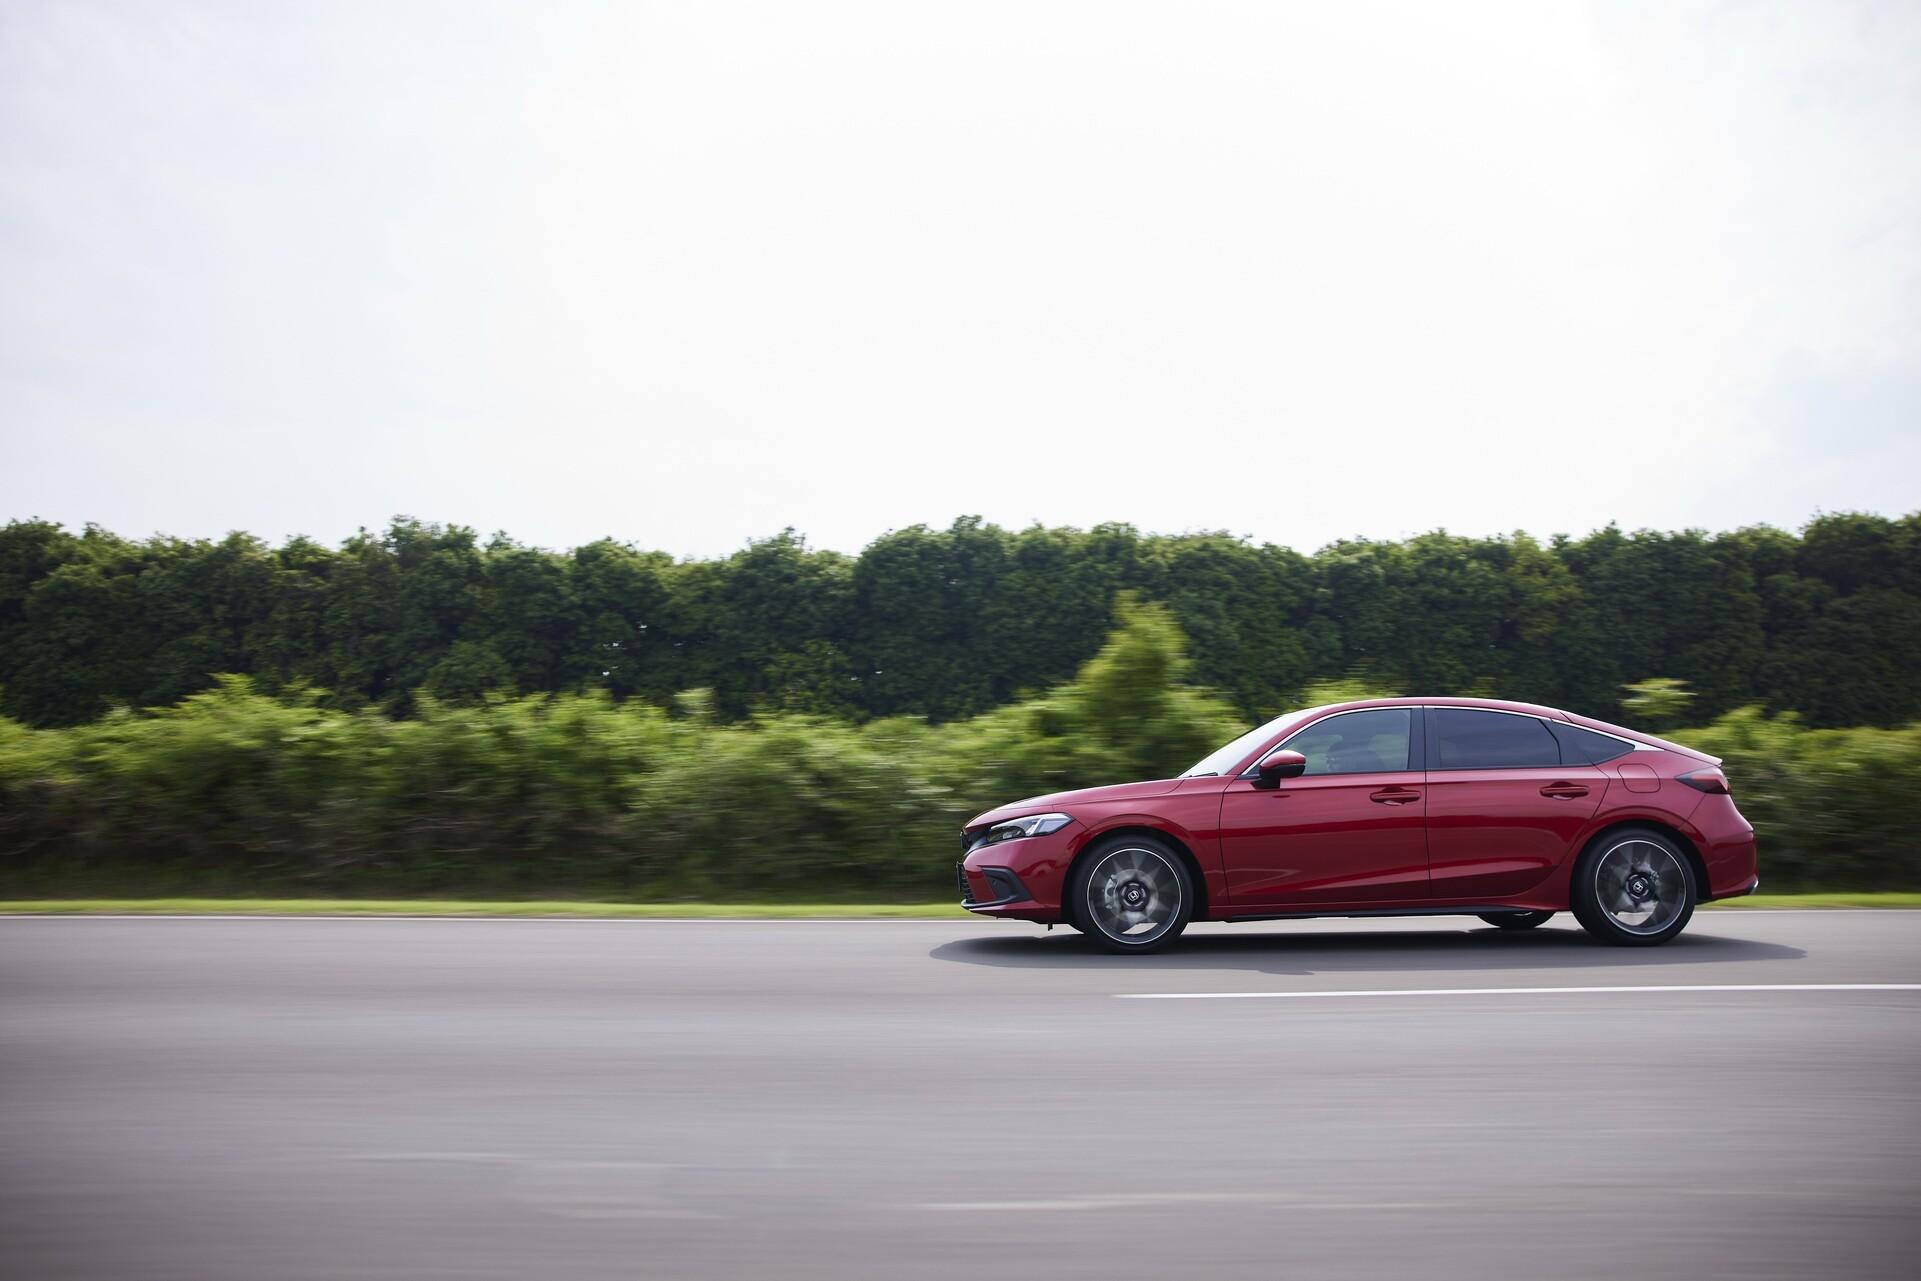 Foto de Honda Civic Hatchback 2022 (16/18)